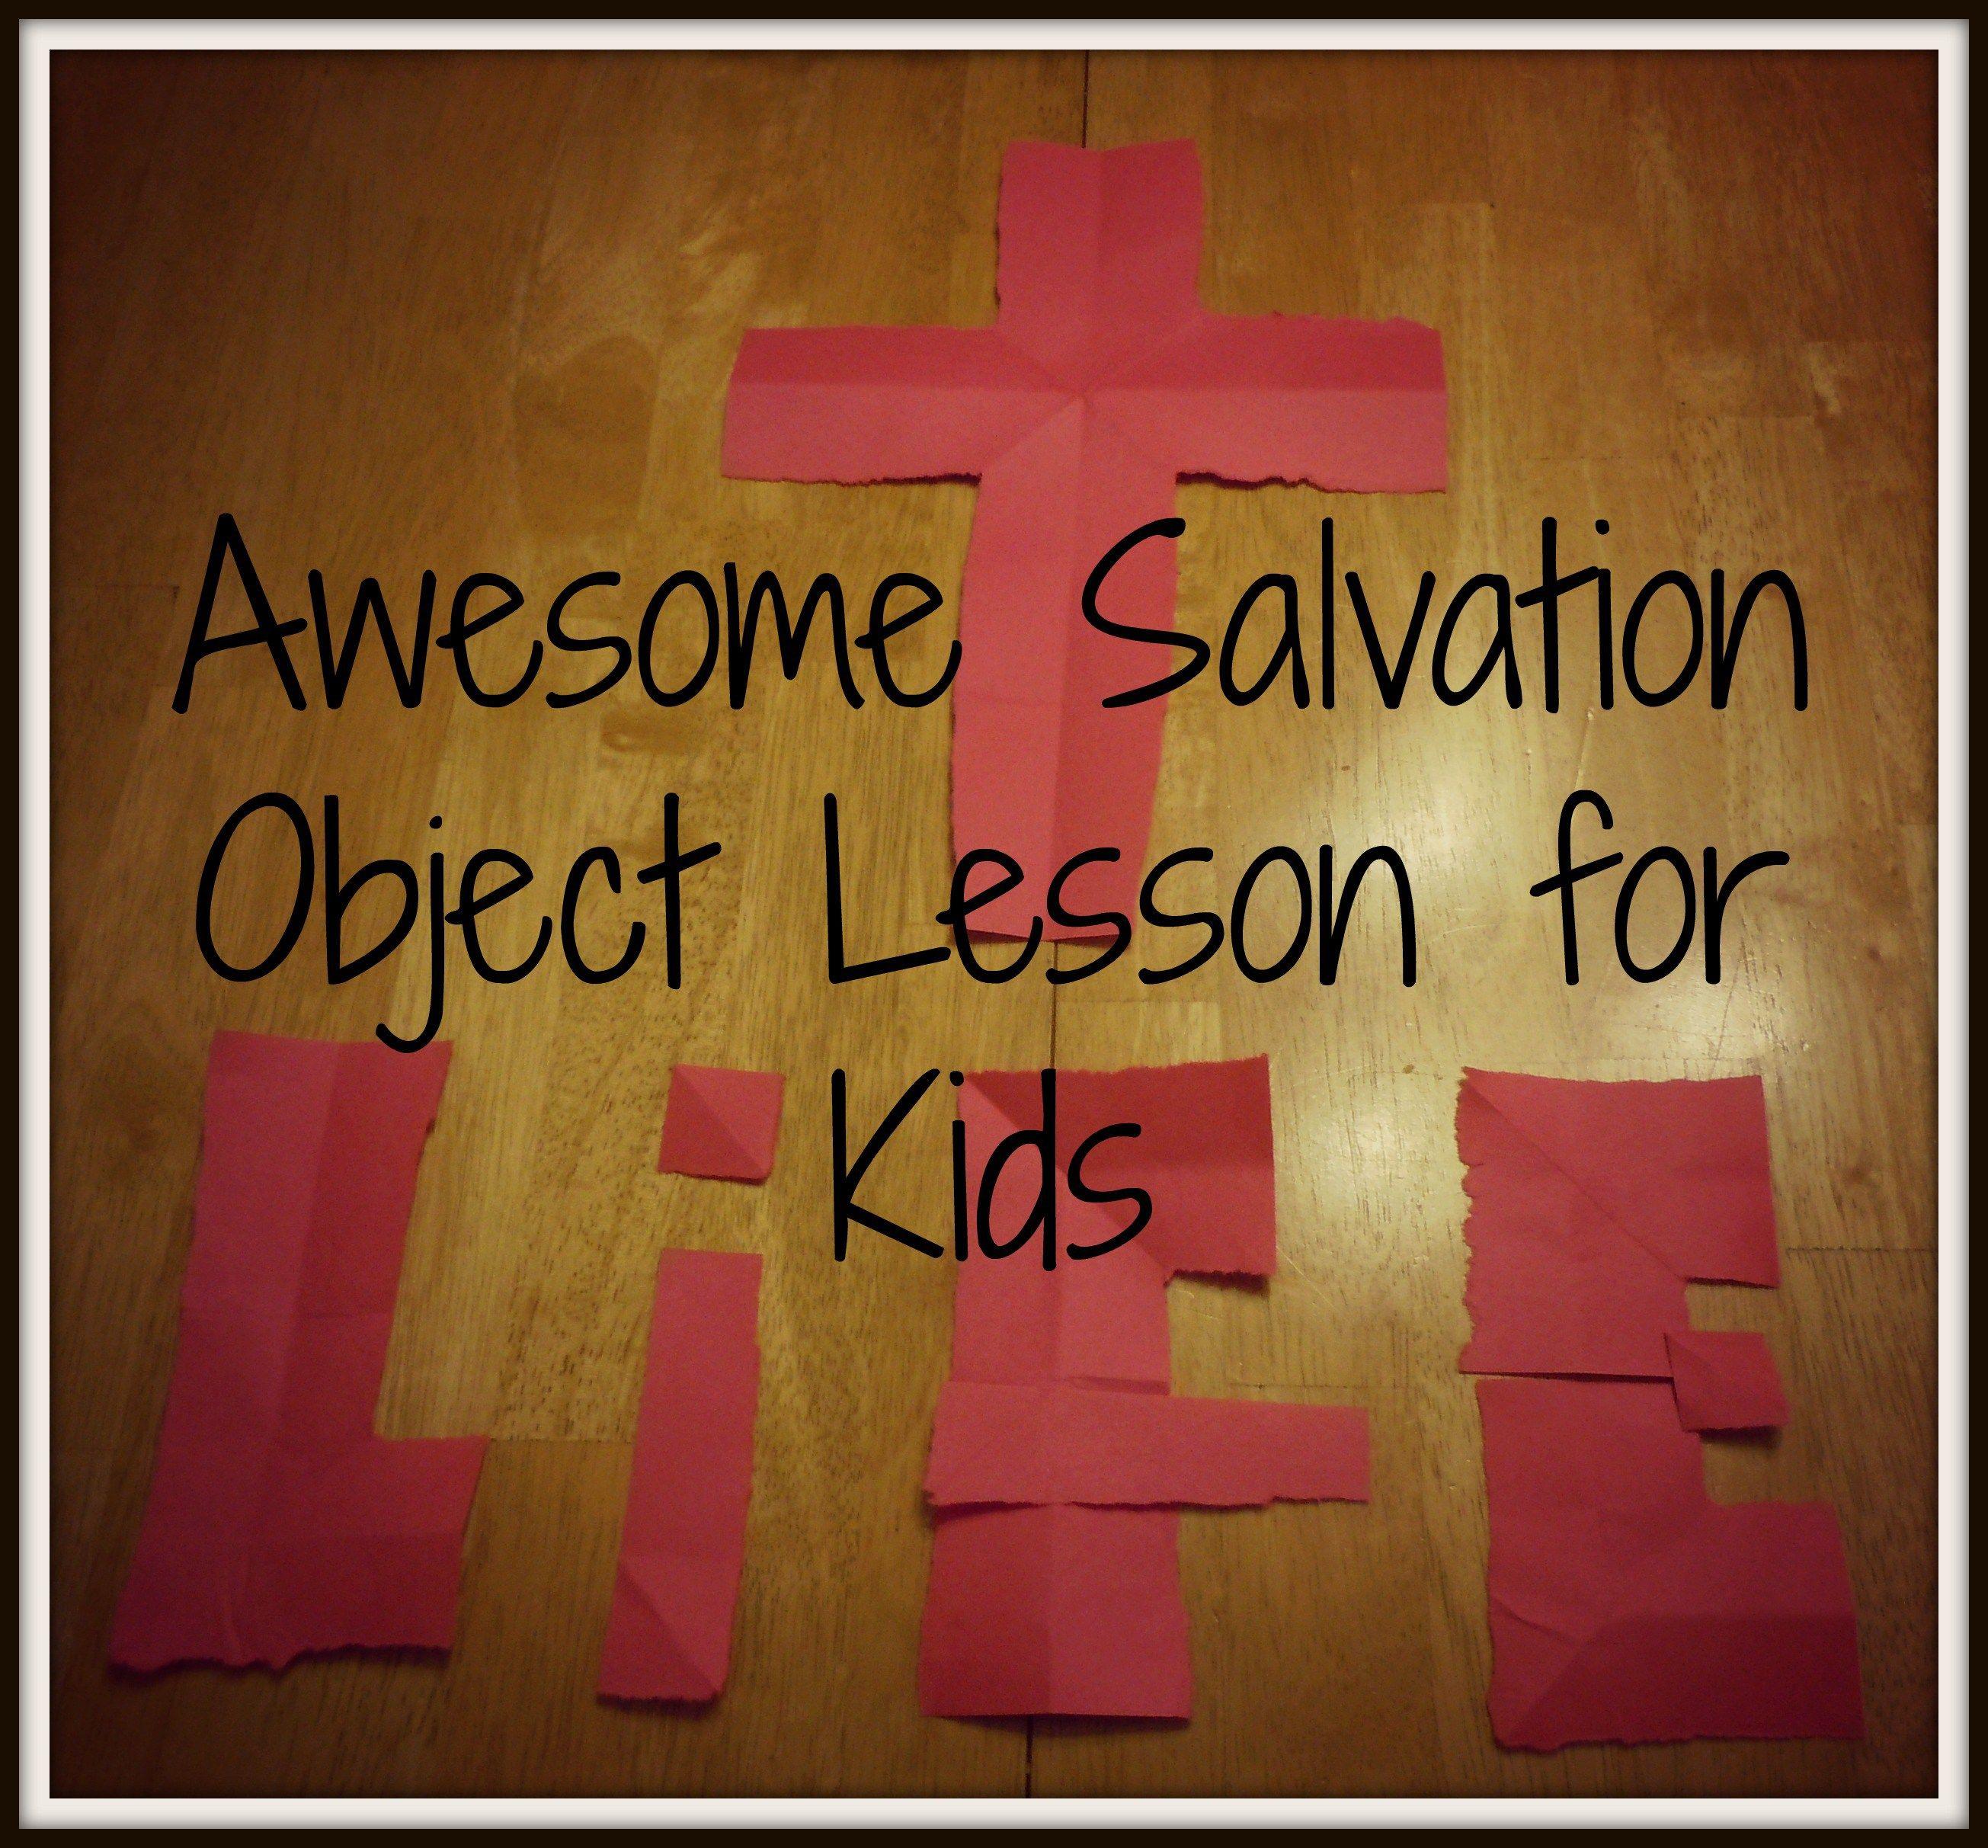 God's Plan of Salvation | Bible.org